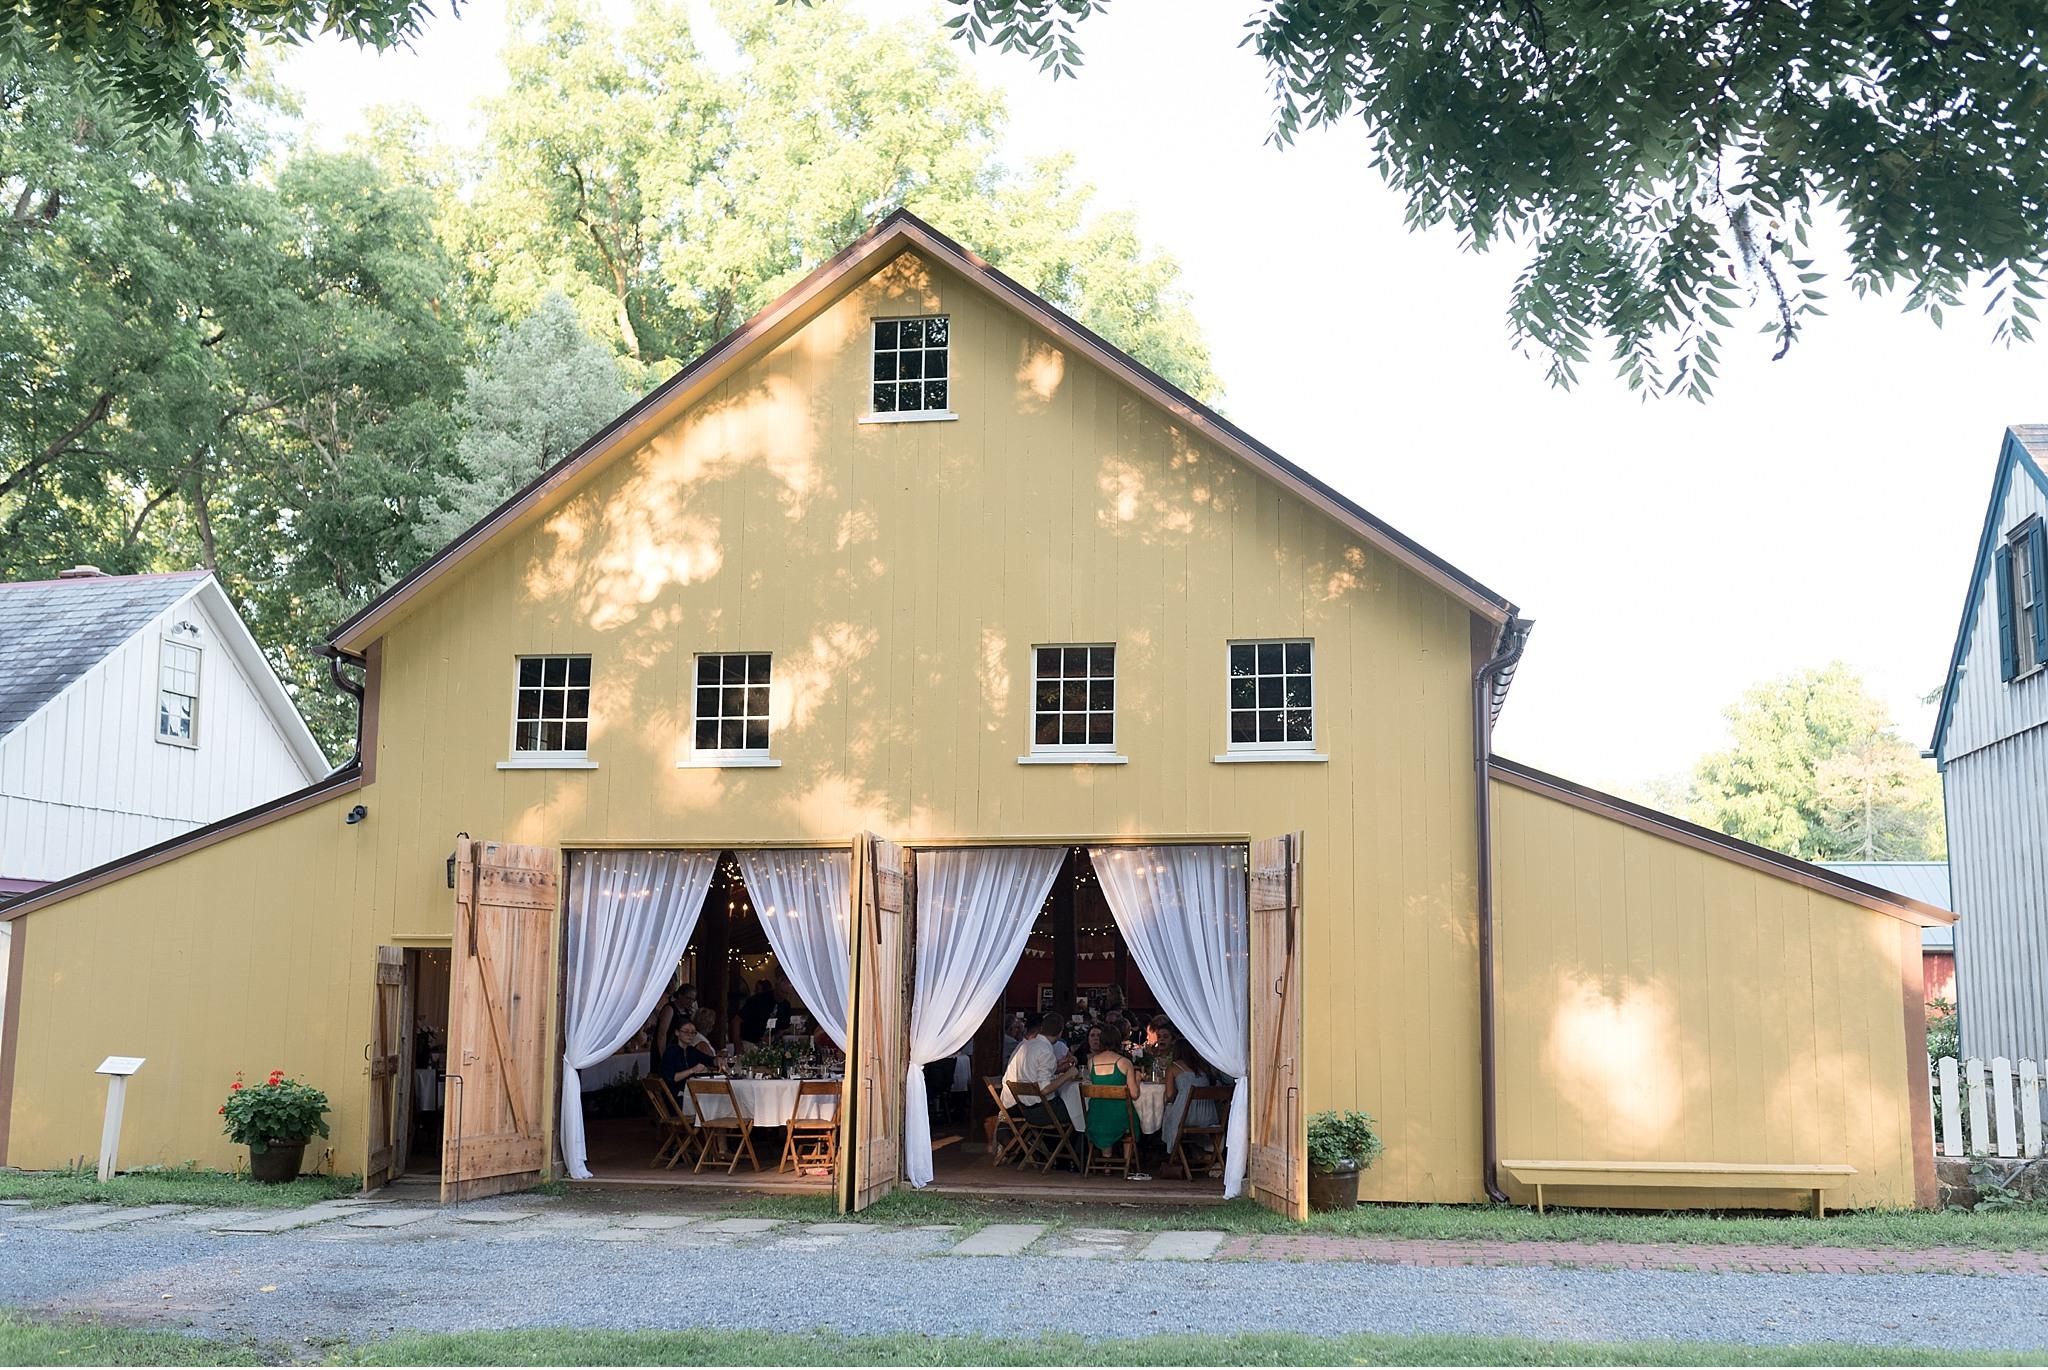 Romantic Summer wedding Landis Valley Museum Lancaster PA wedding photography John Deere Tractor_1985.jpg